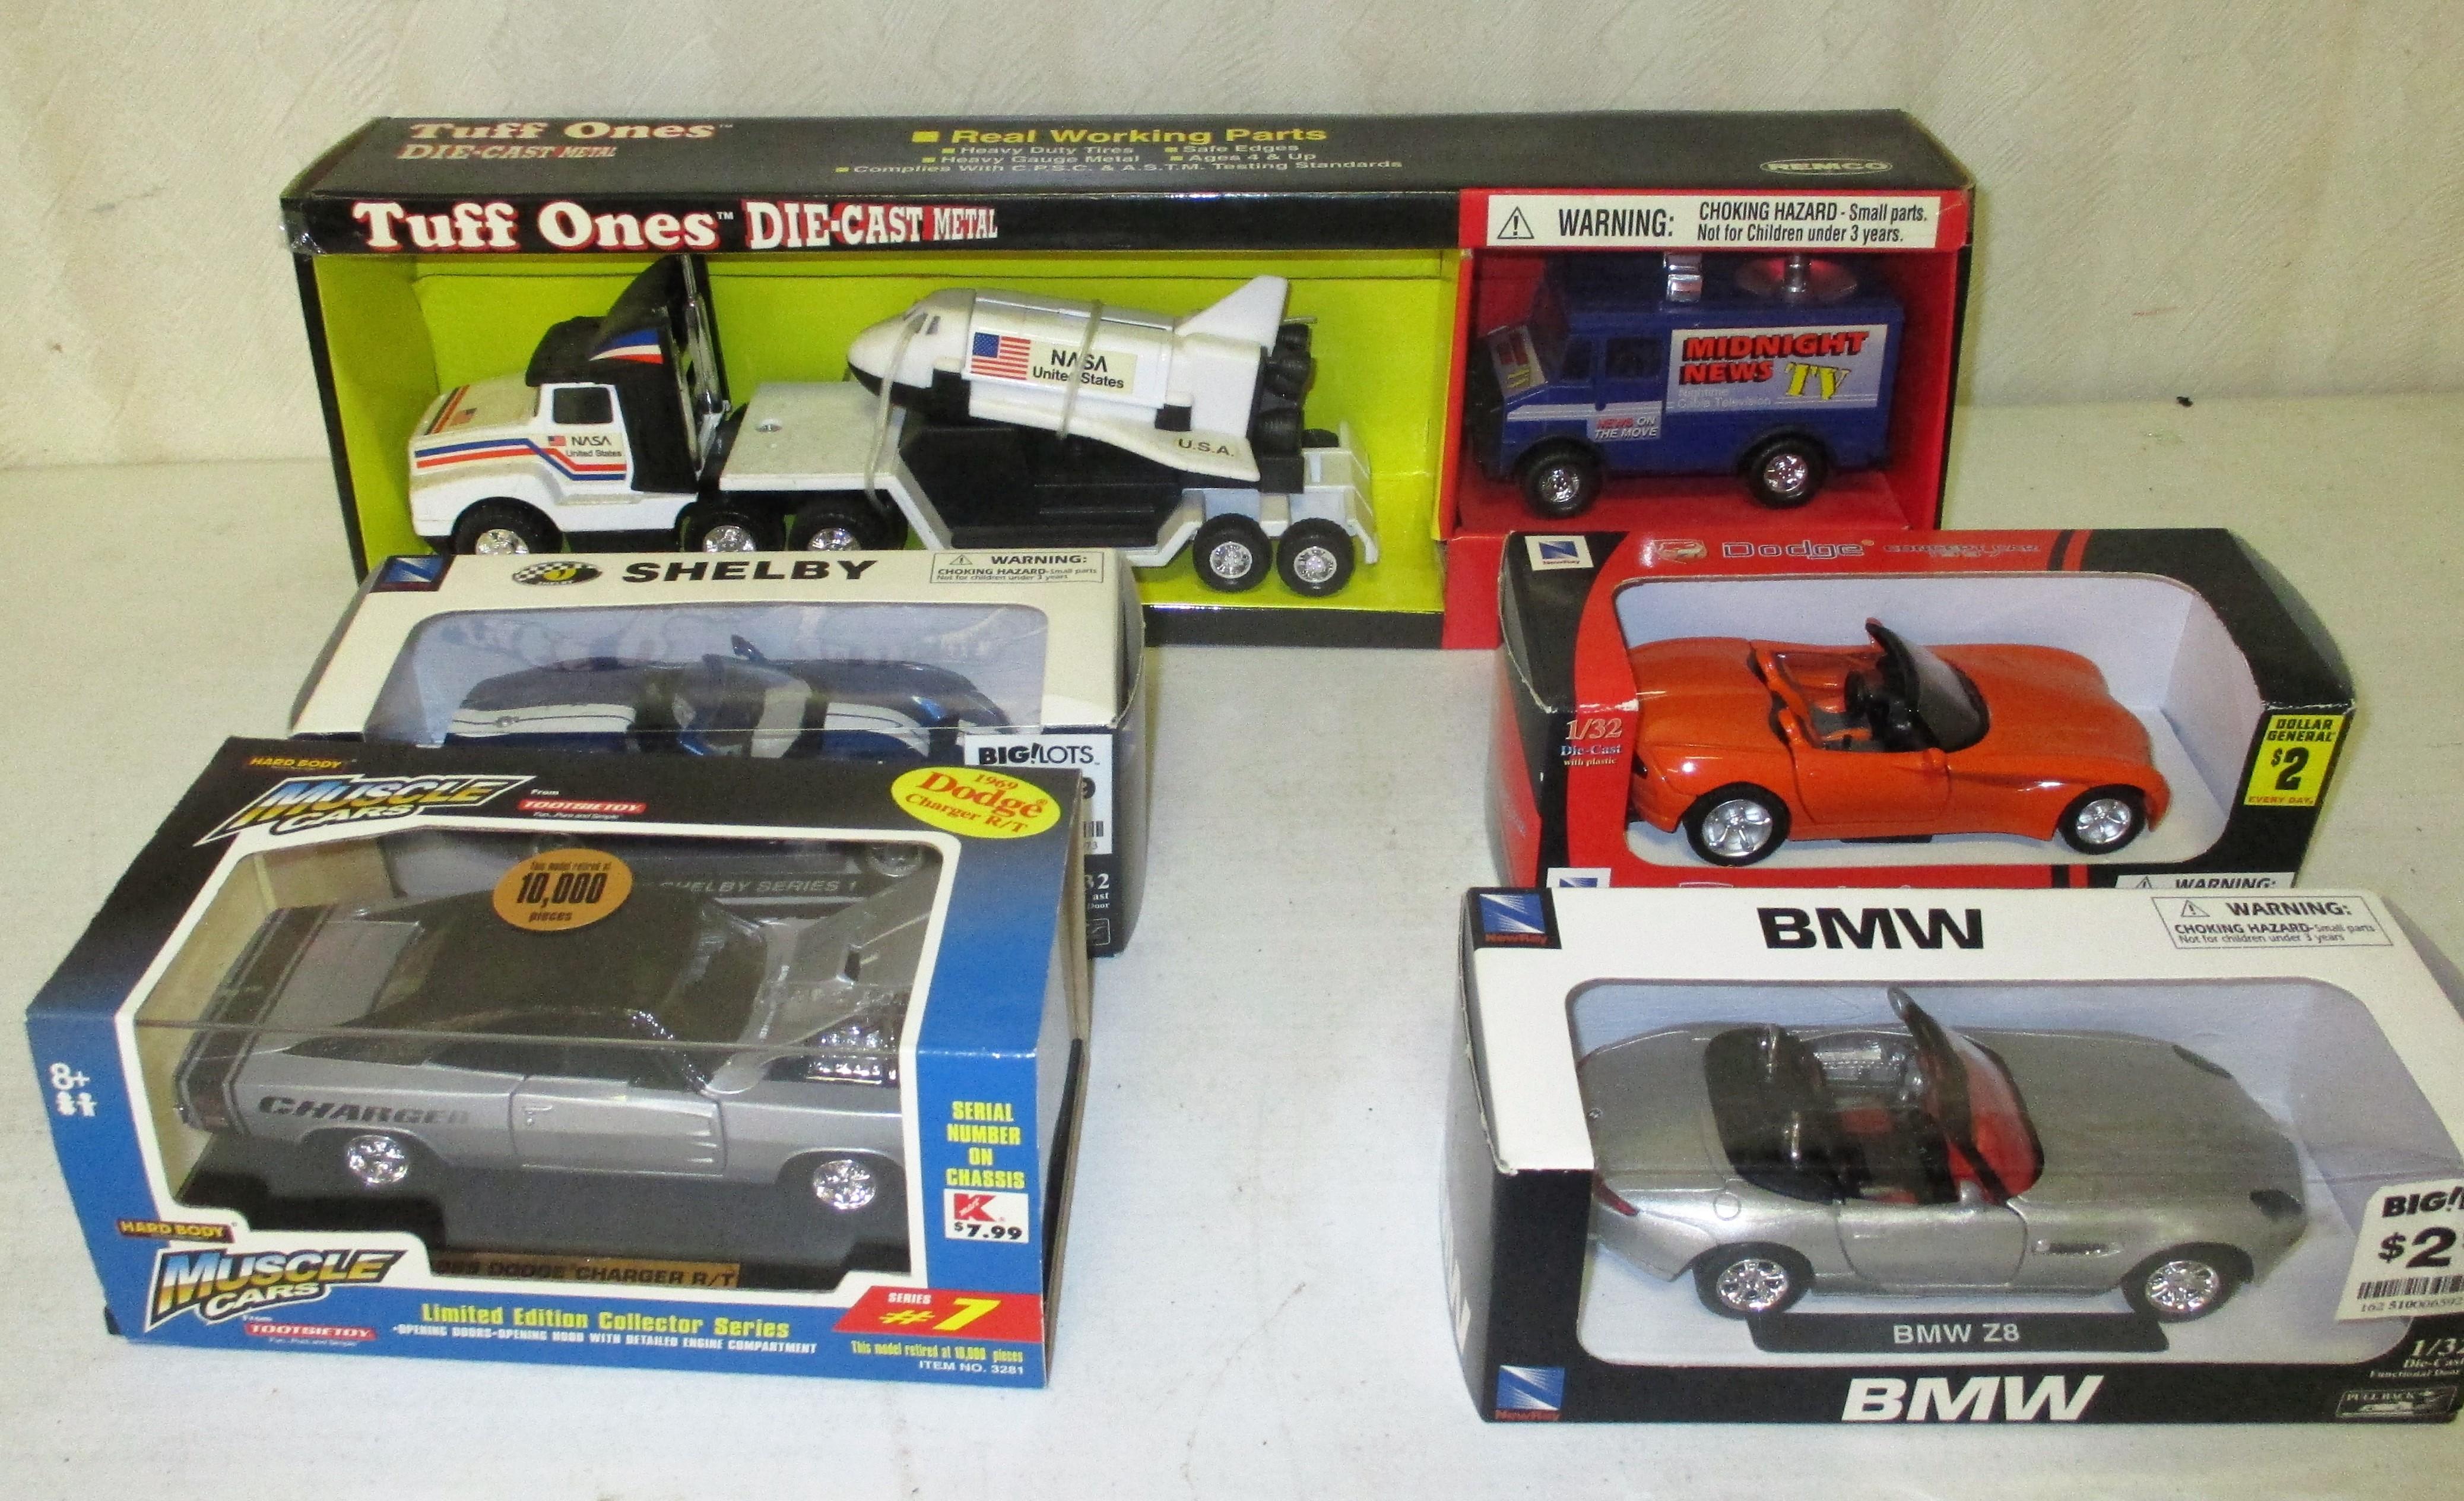 119: Toy Vehicle Lot